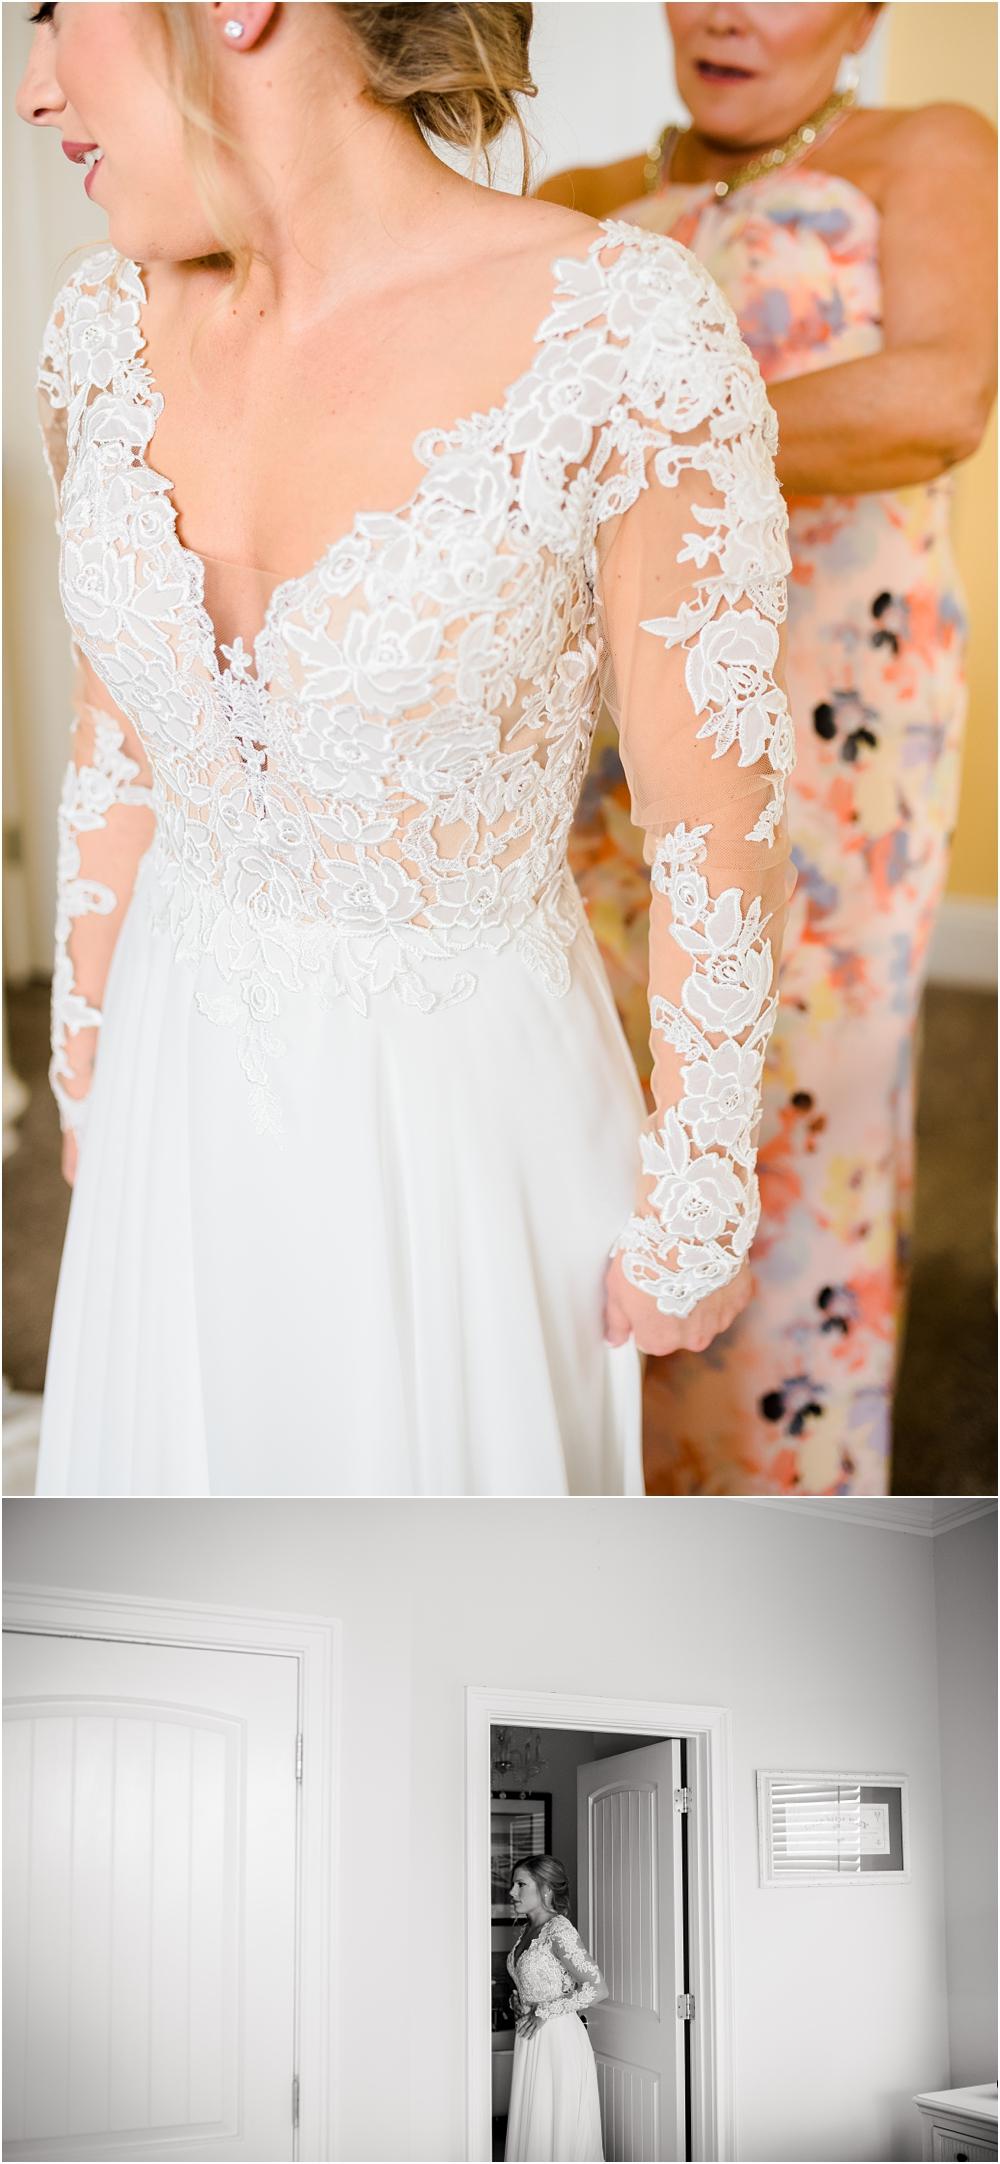 carrillo-triple-crown-santa-rosa-beach-florida-wedding-kiersten-stevenson-photography41.jpg